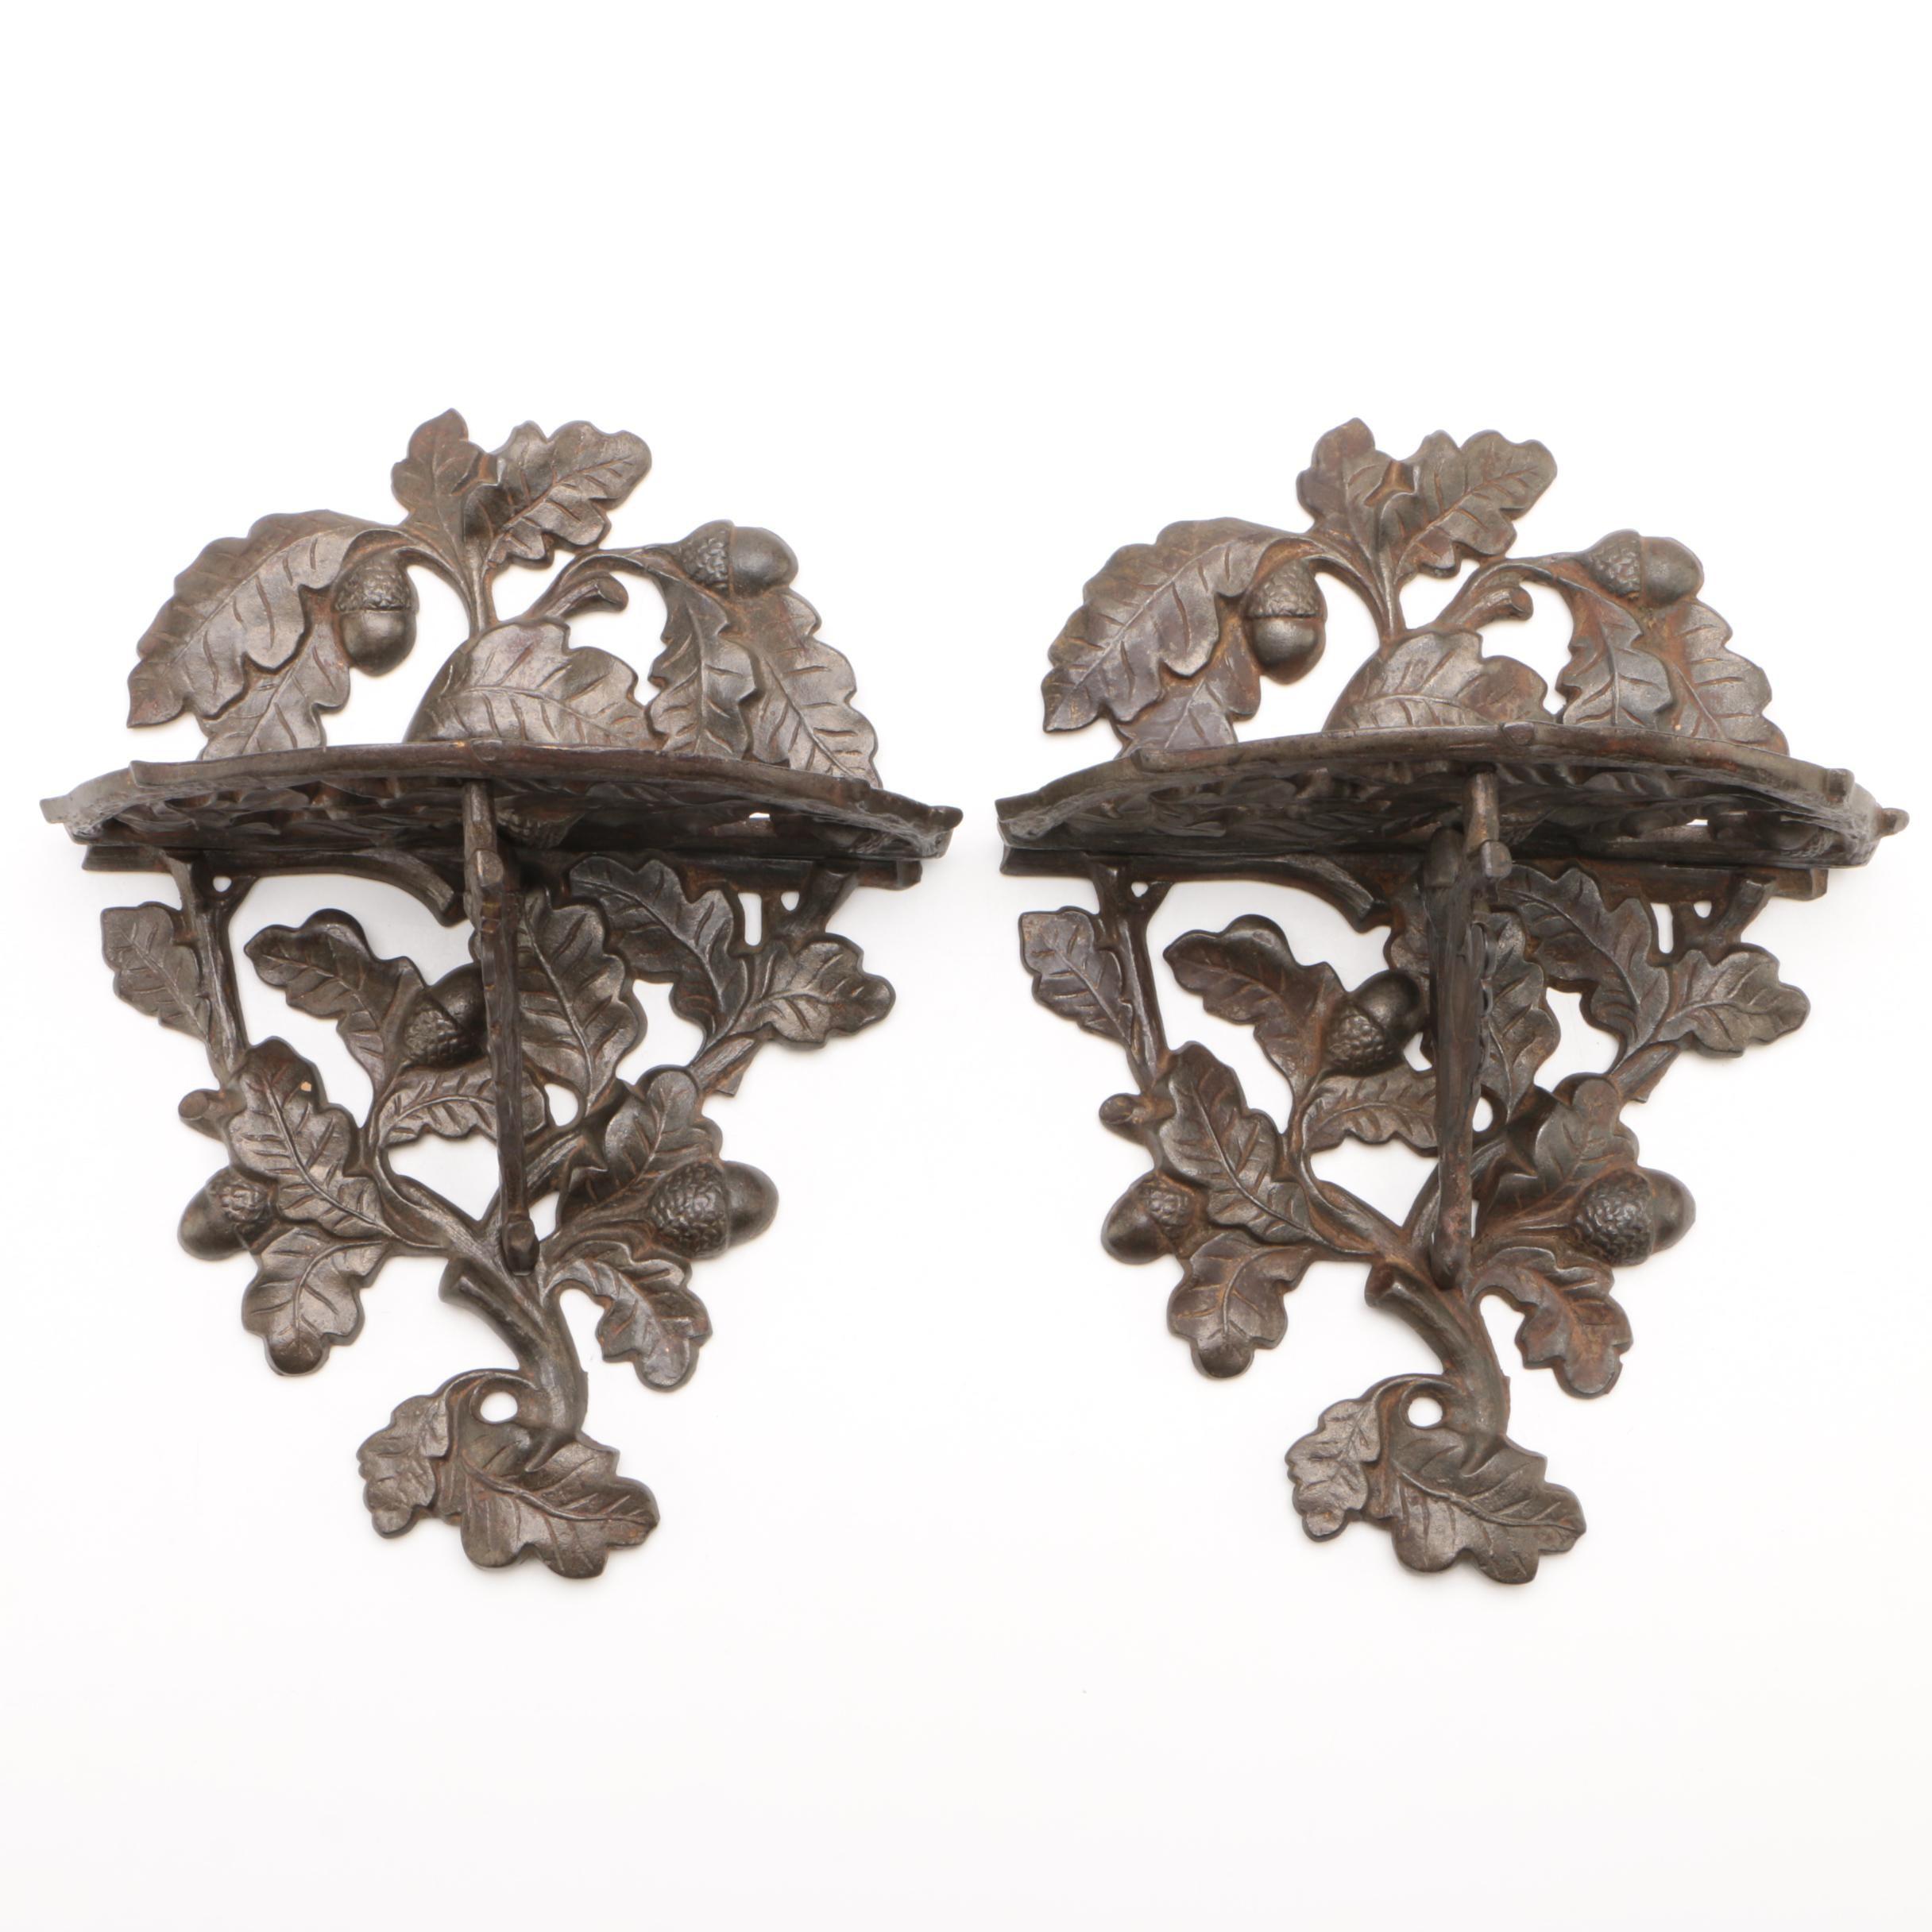 Cast Iron Oak Leaf and Acorn Brackets, Late 19th Century